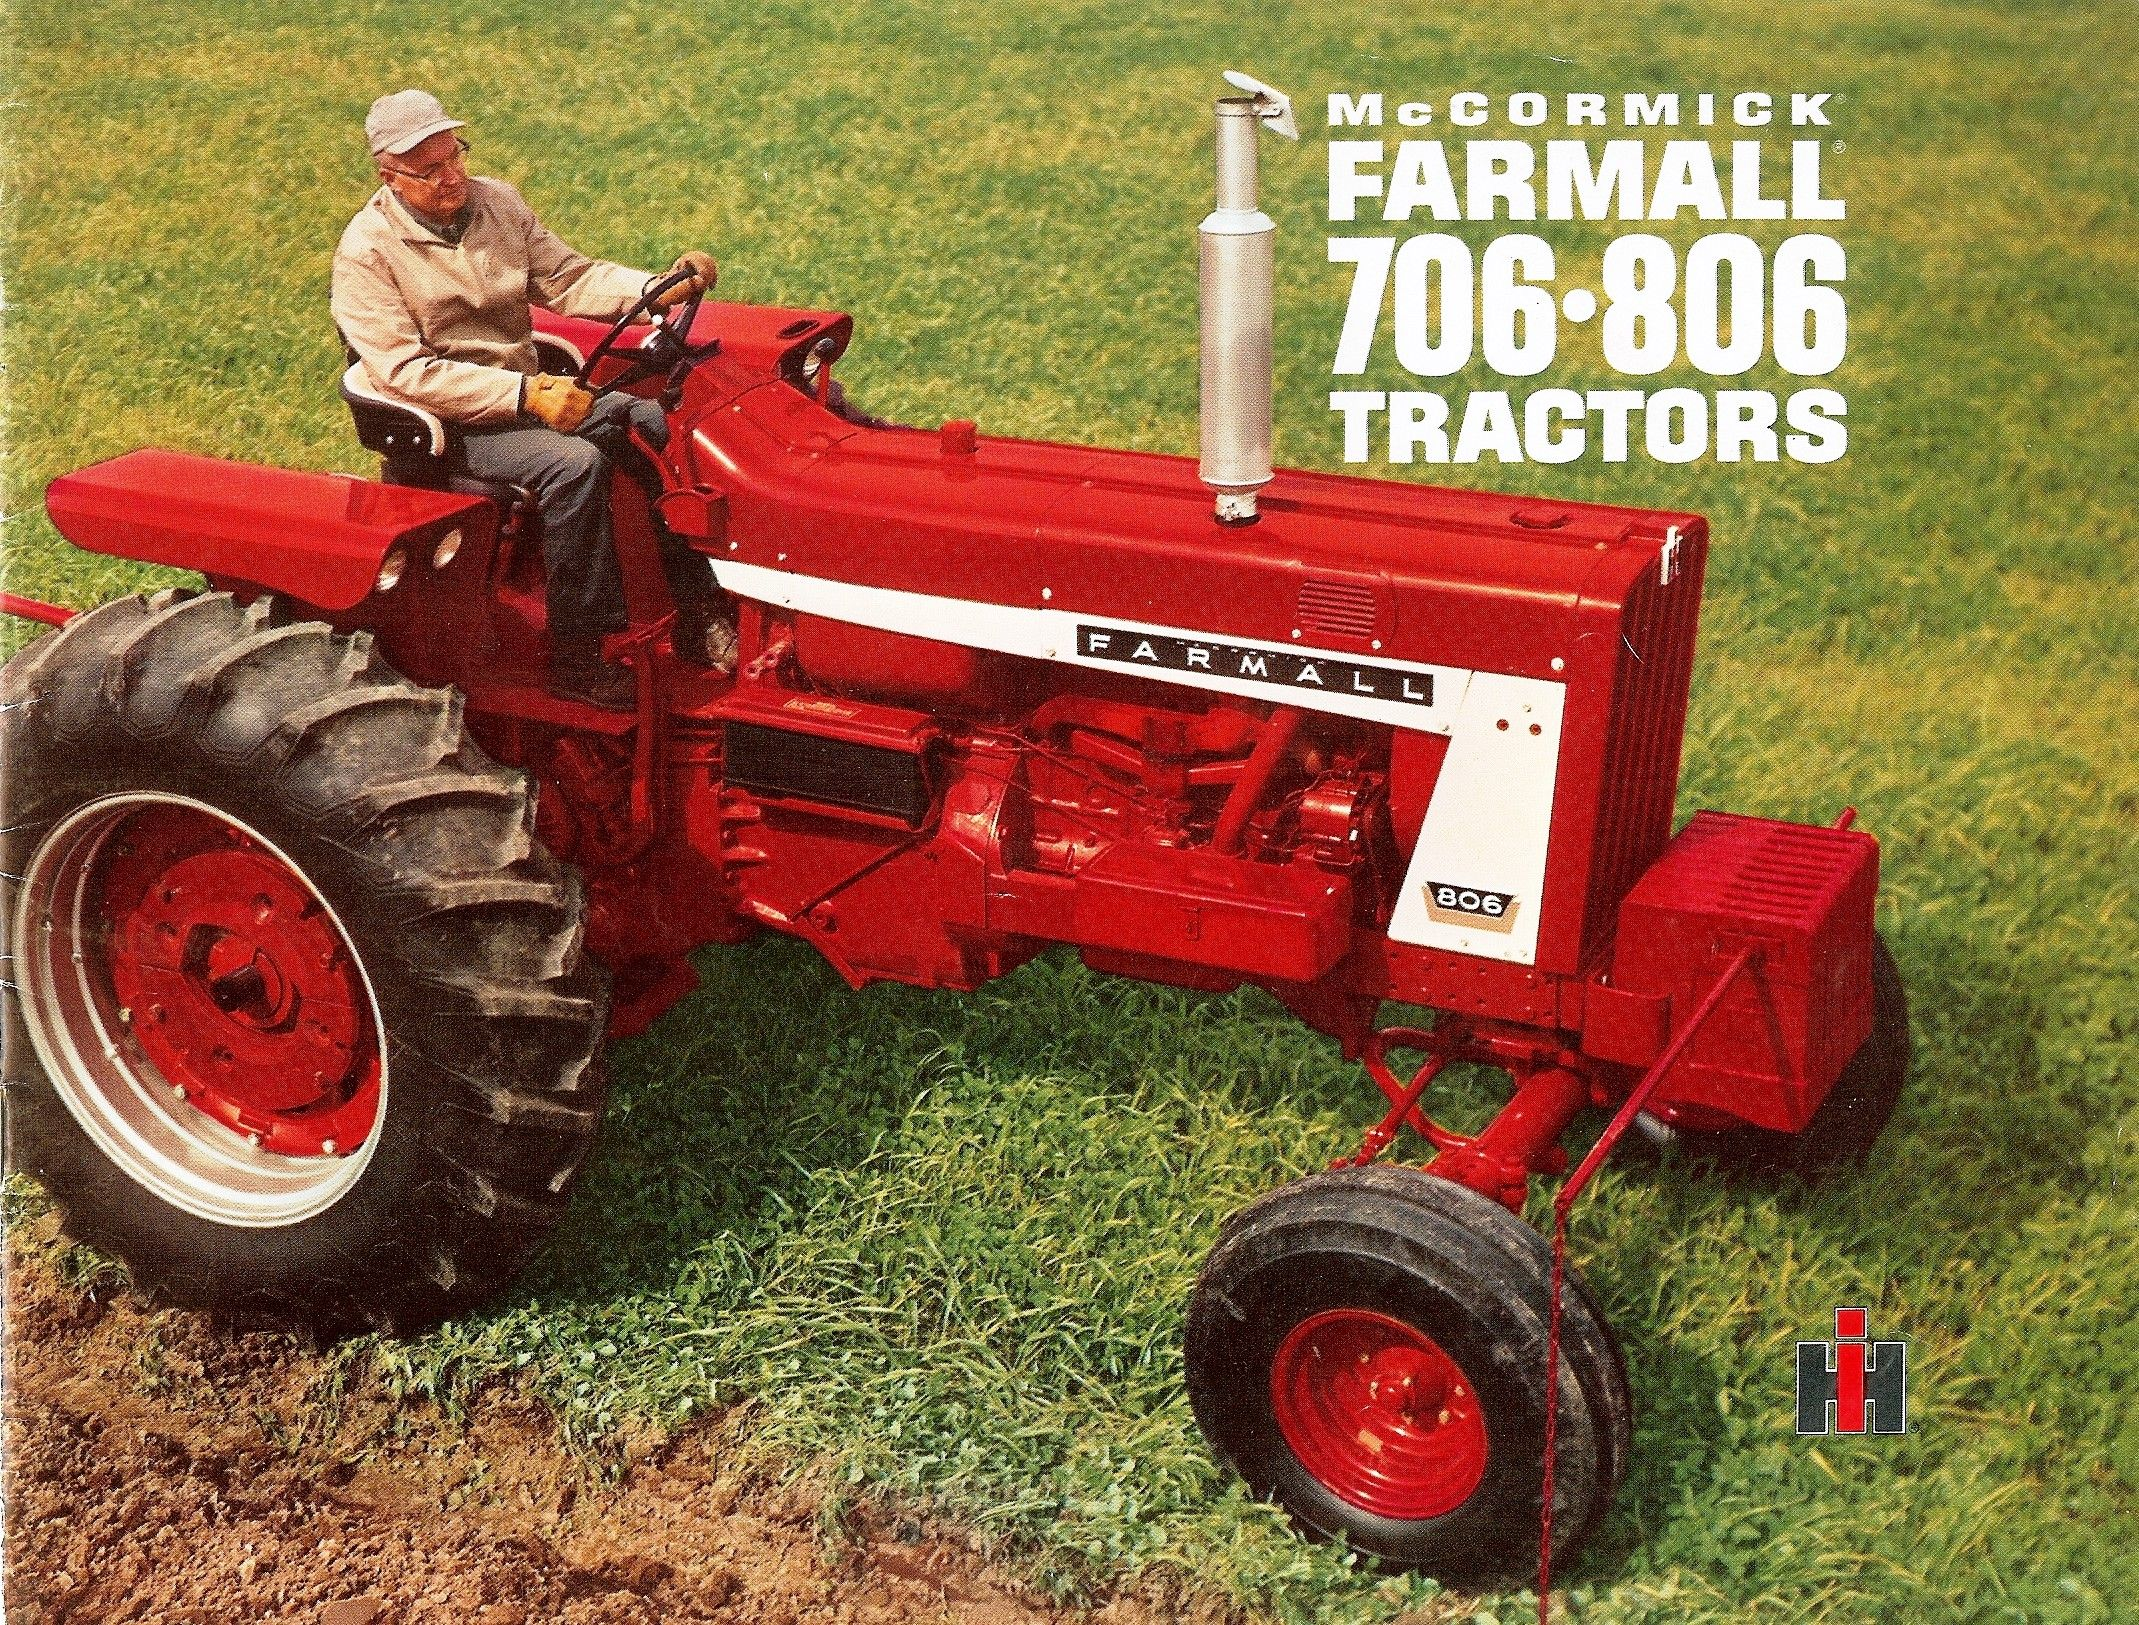 medium resolution of farmall 706 806 tractors international harvester advertising set also 806 farmall tractor wiring harness in addition 560 farmall